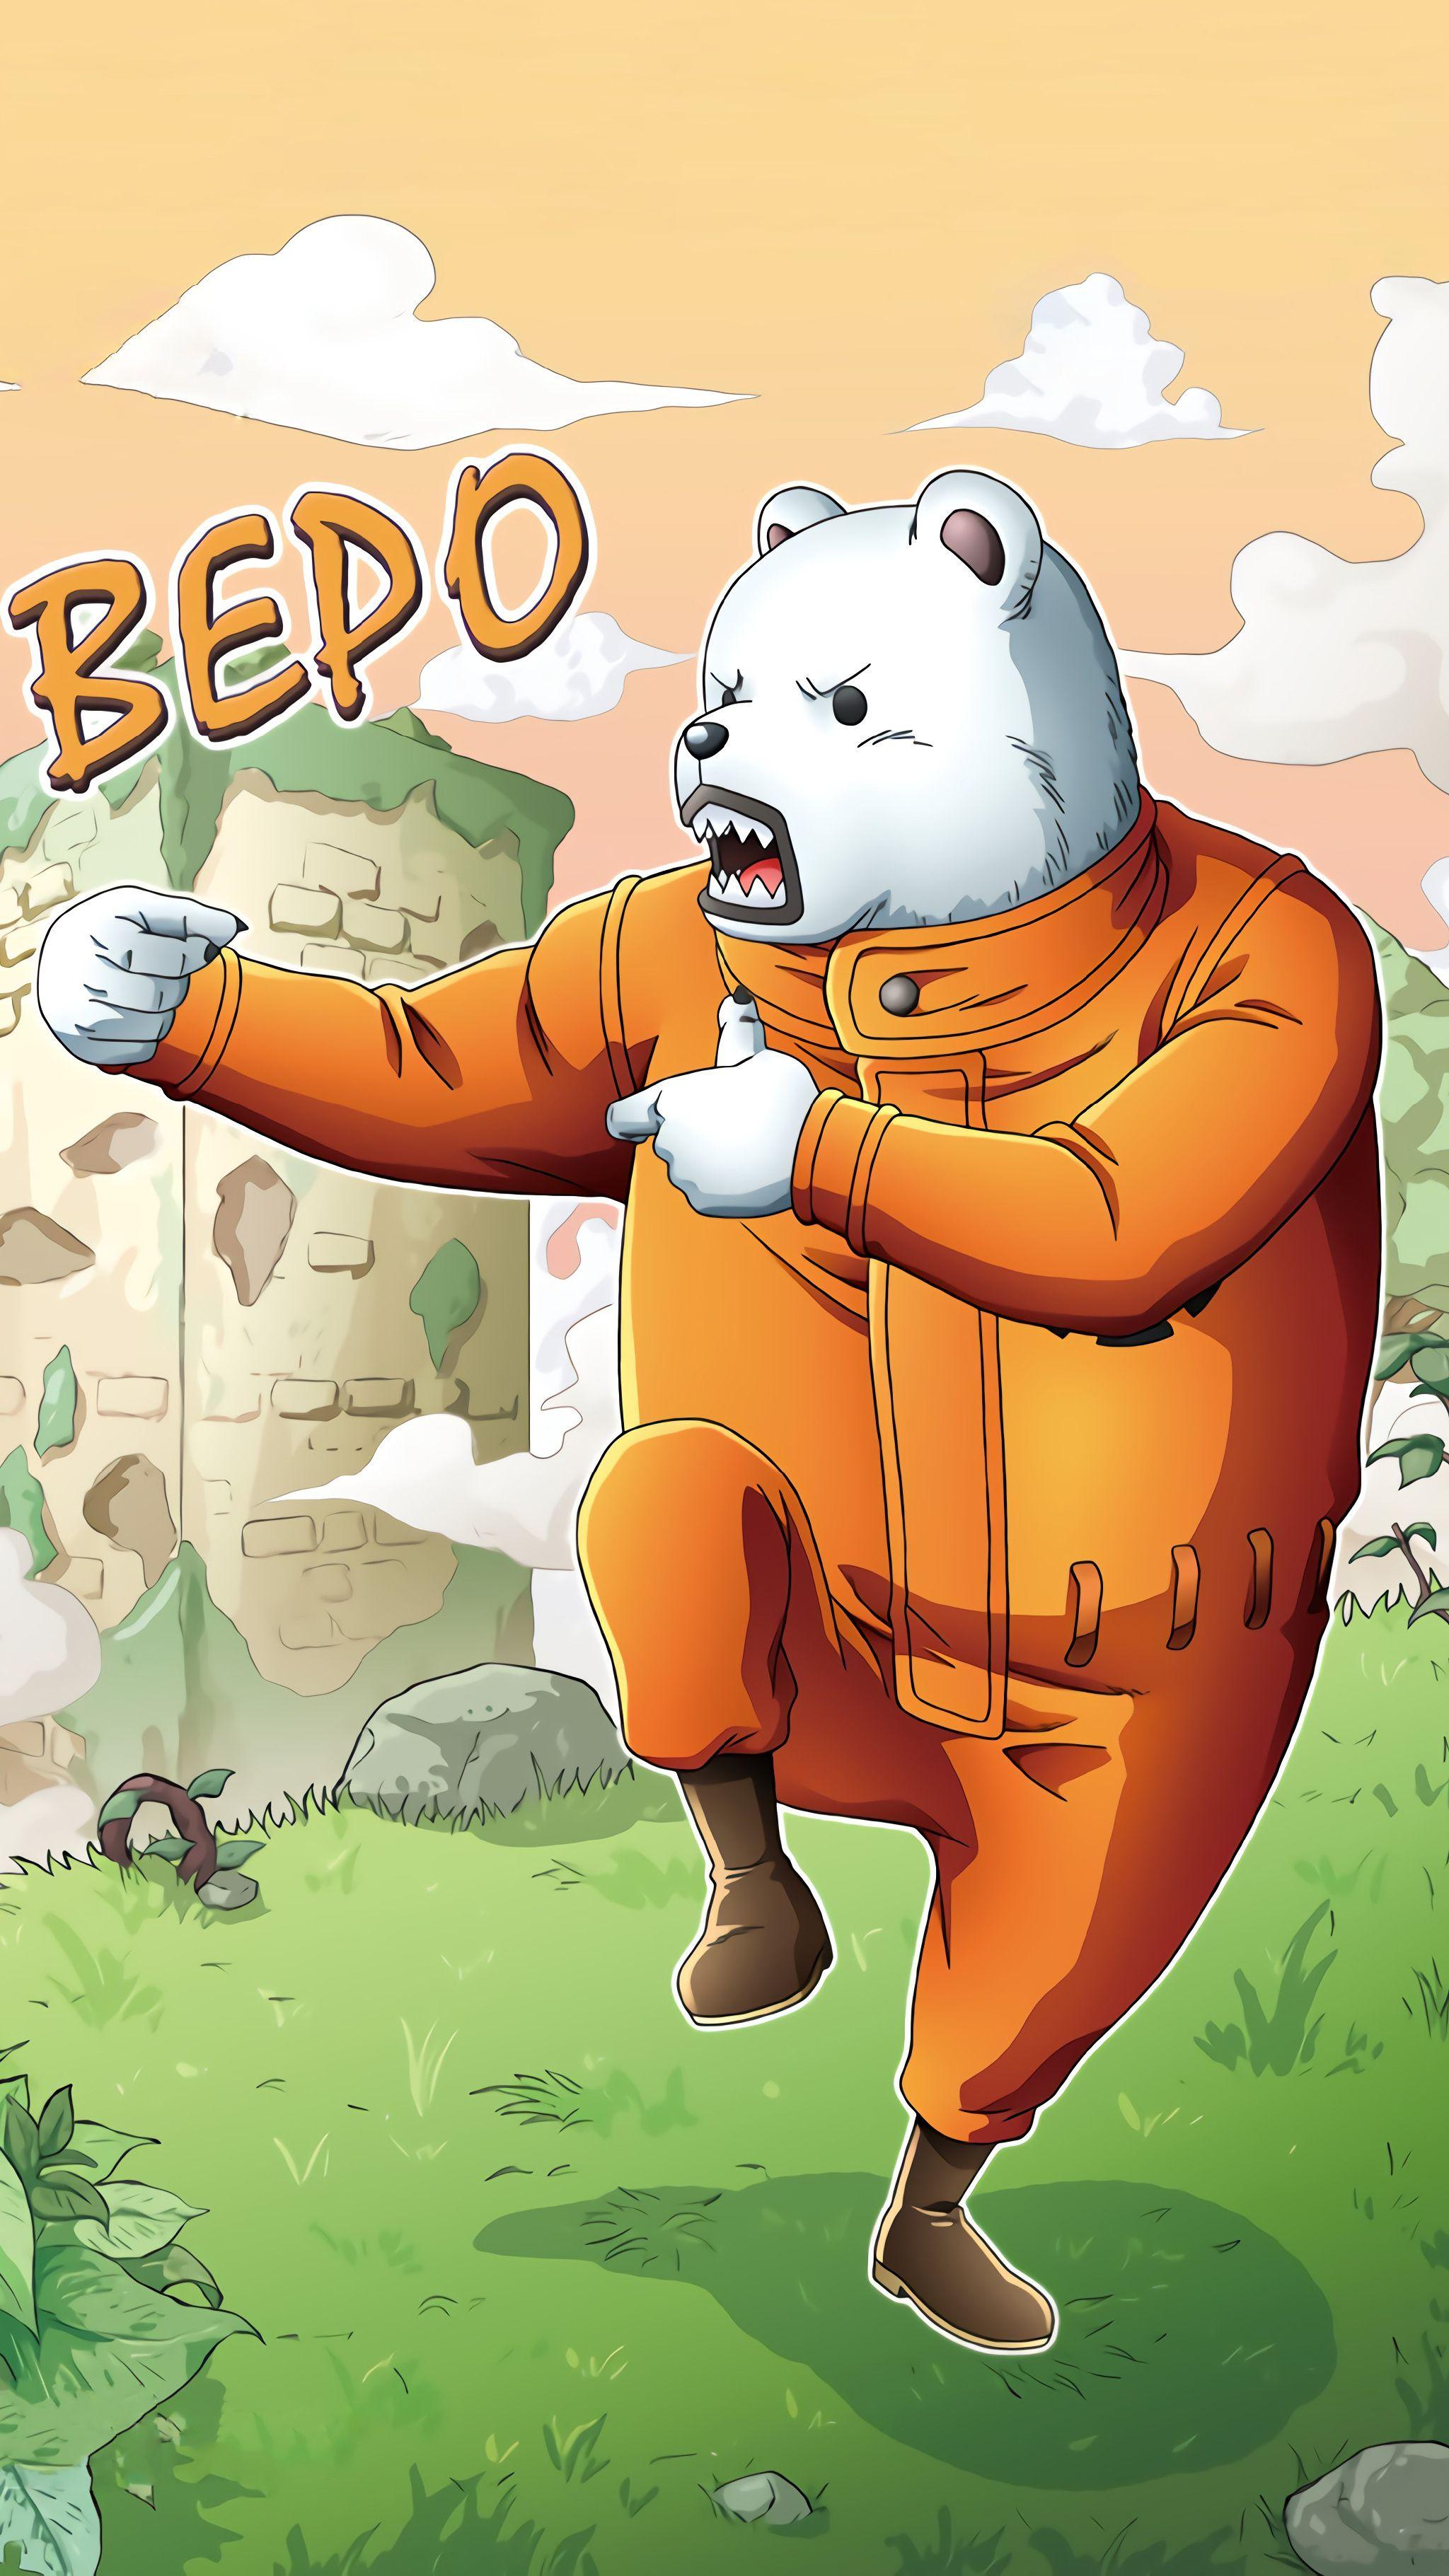 Bepo Wallpapers - Wallpaper Cave